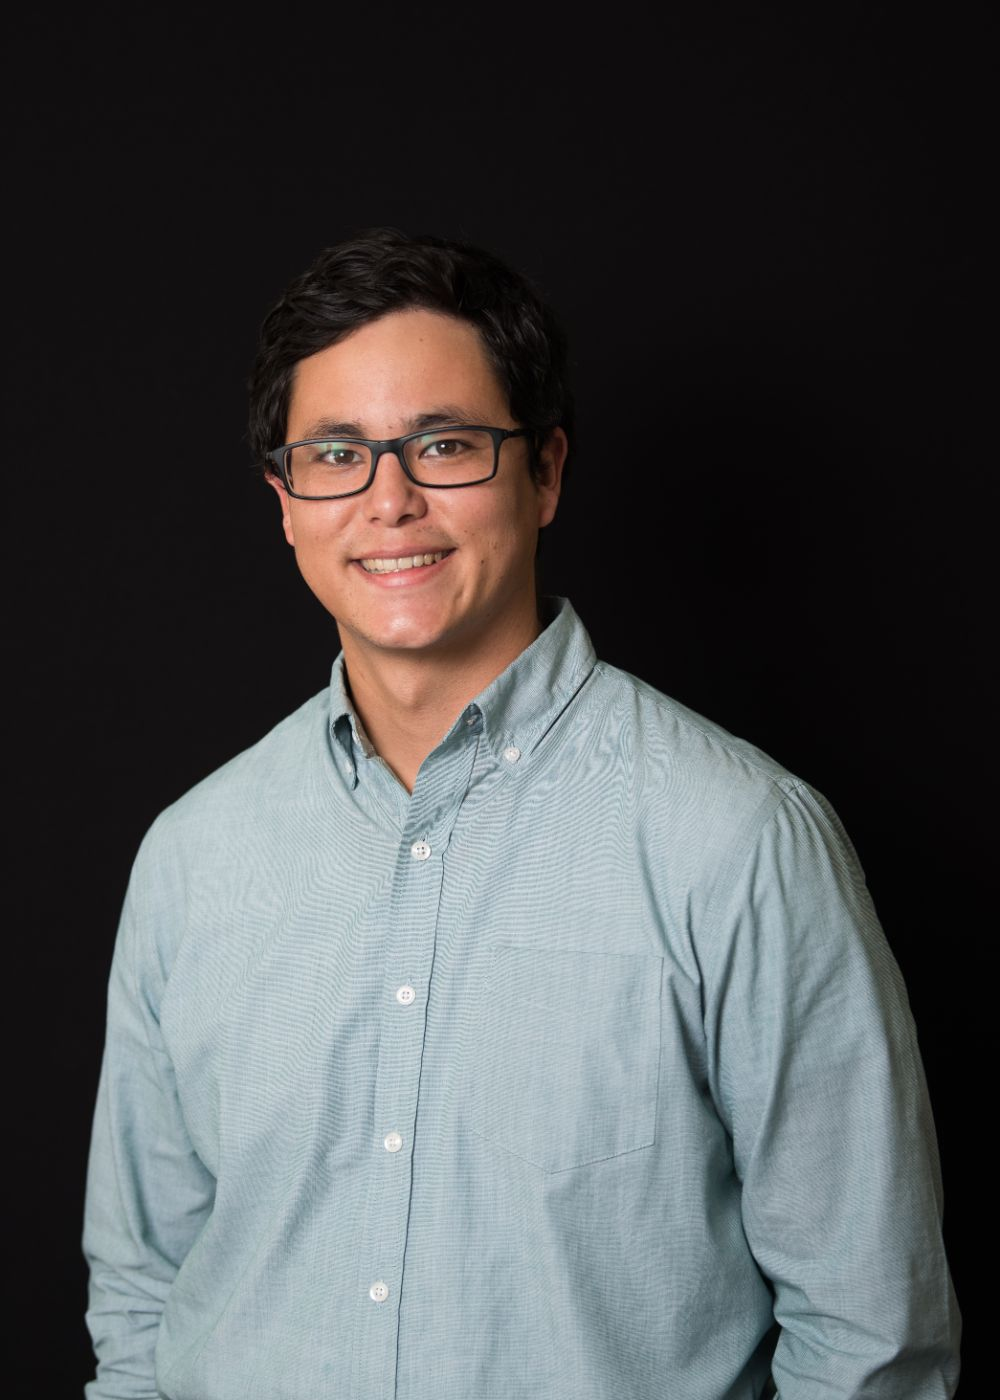 Photo of Colin Nishitani, CPA at Peterson and Associates